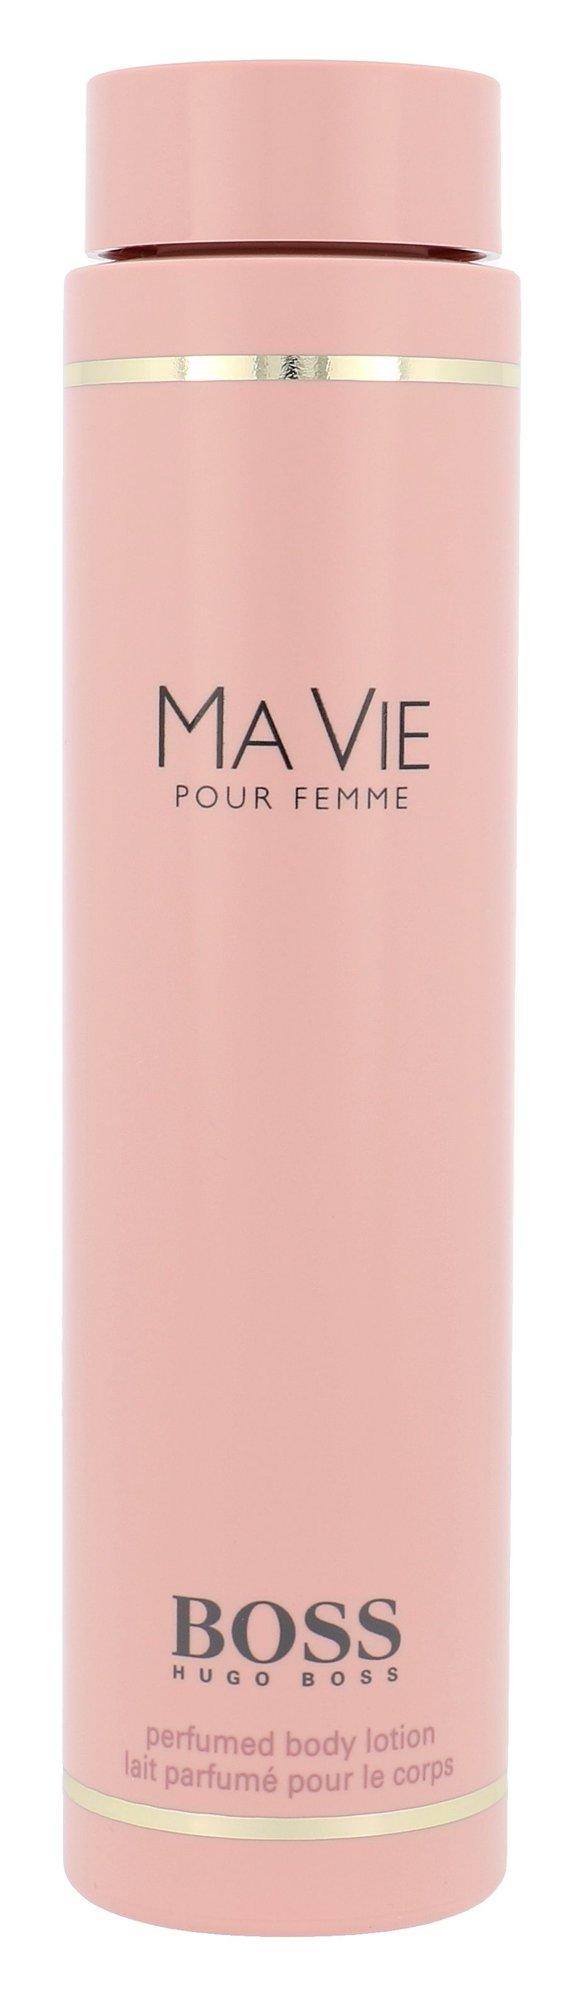 HUGO BOSS Boss Ma Vie Pour Femme, Telové mlieko 200ml